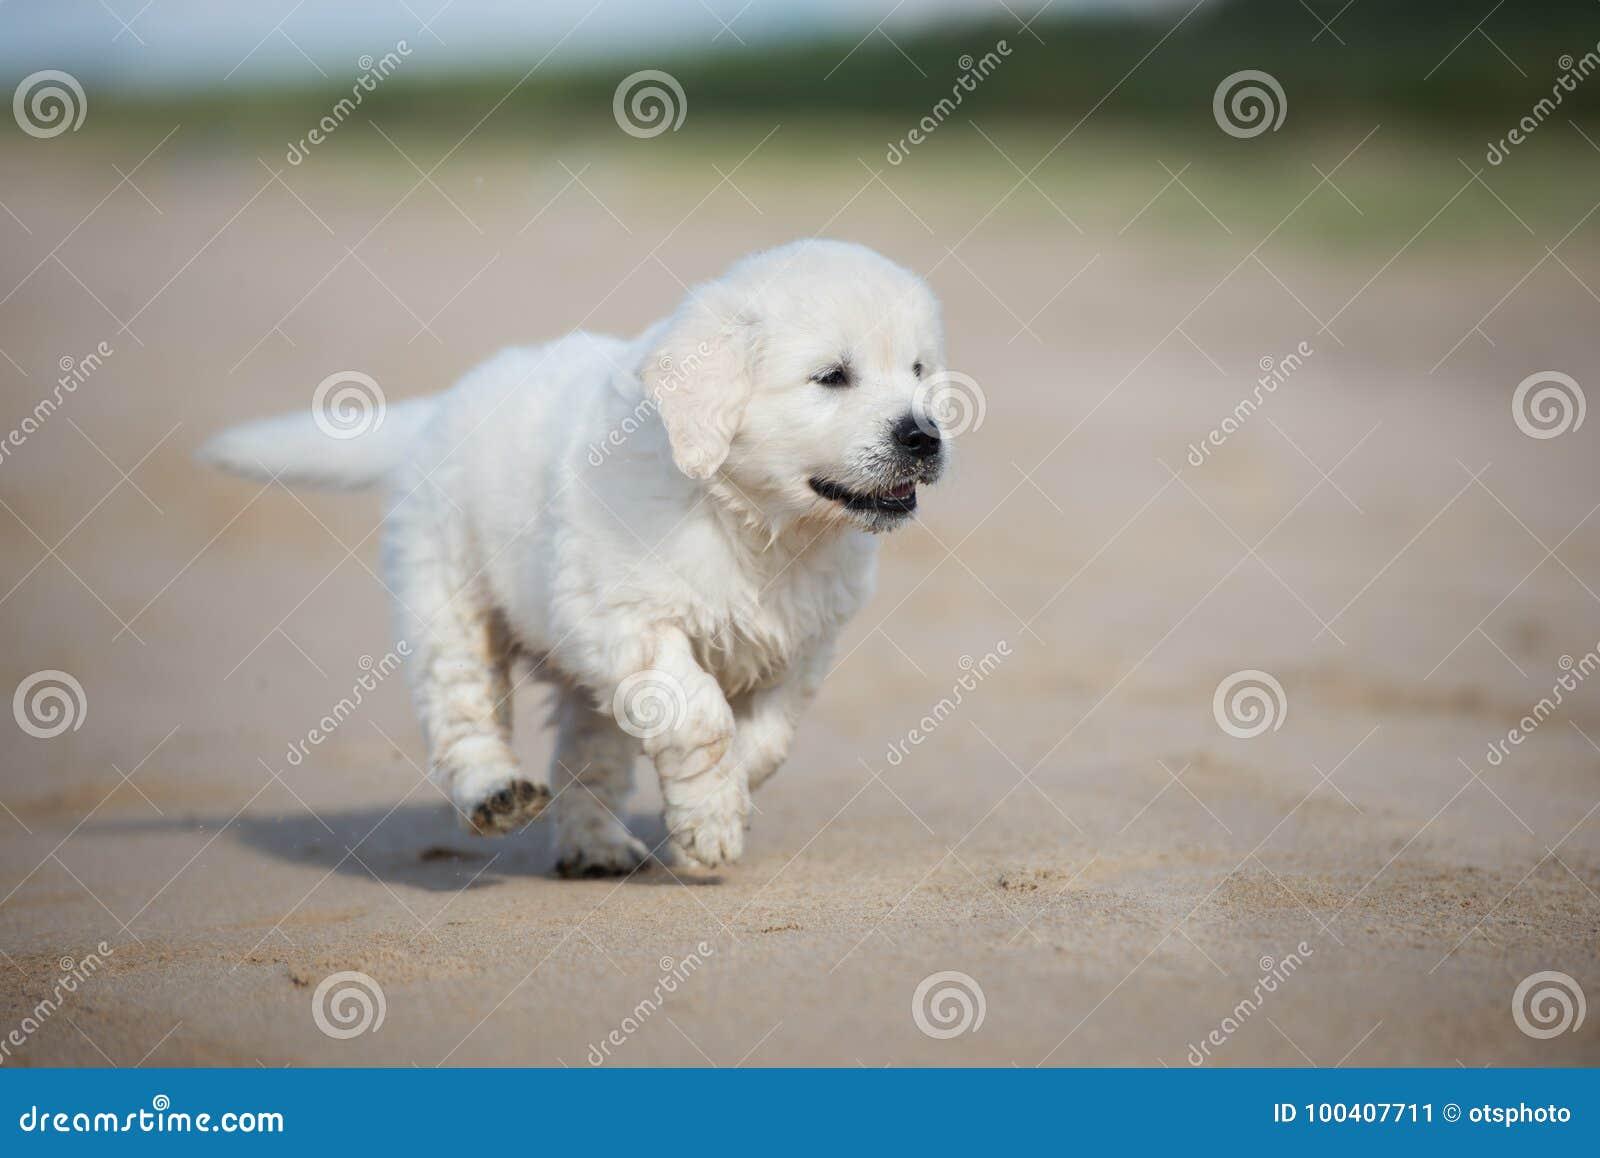 Golden Retriever Puppy Running On A Beach Stock Image Image Of